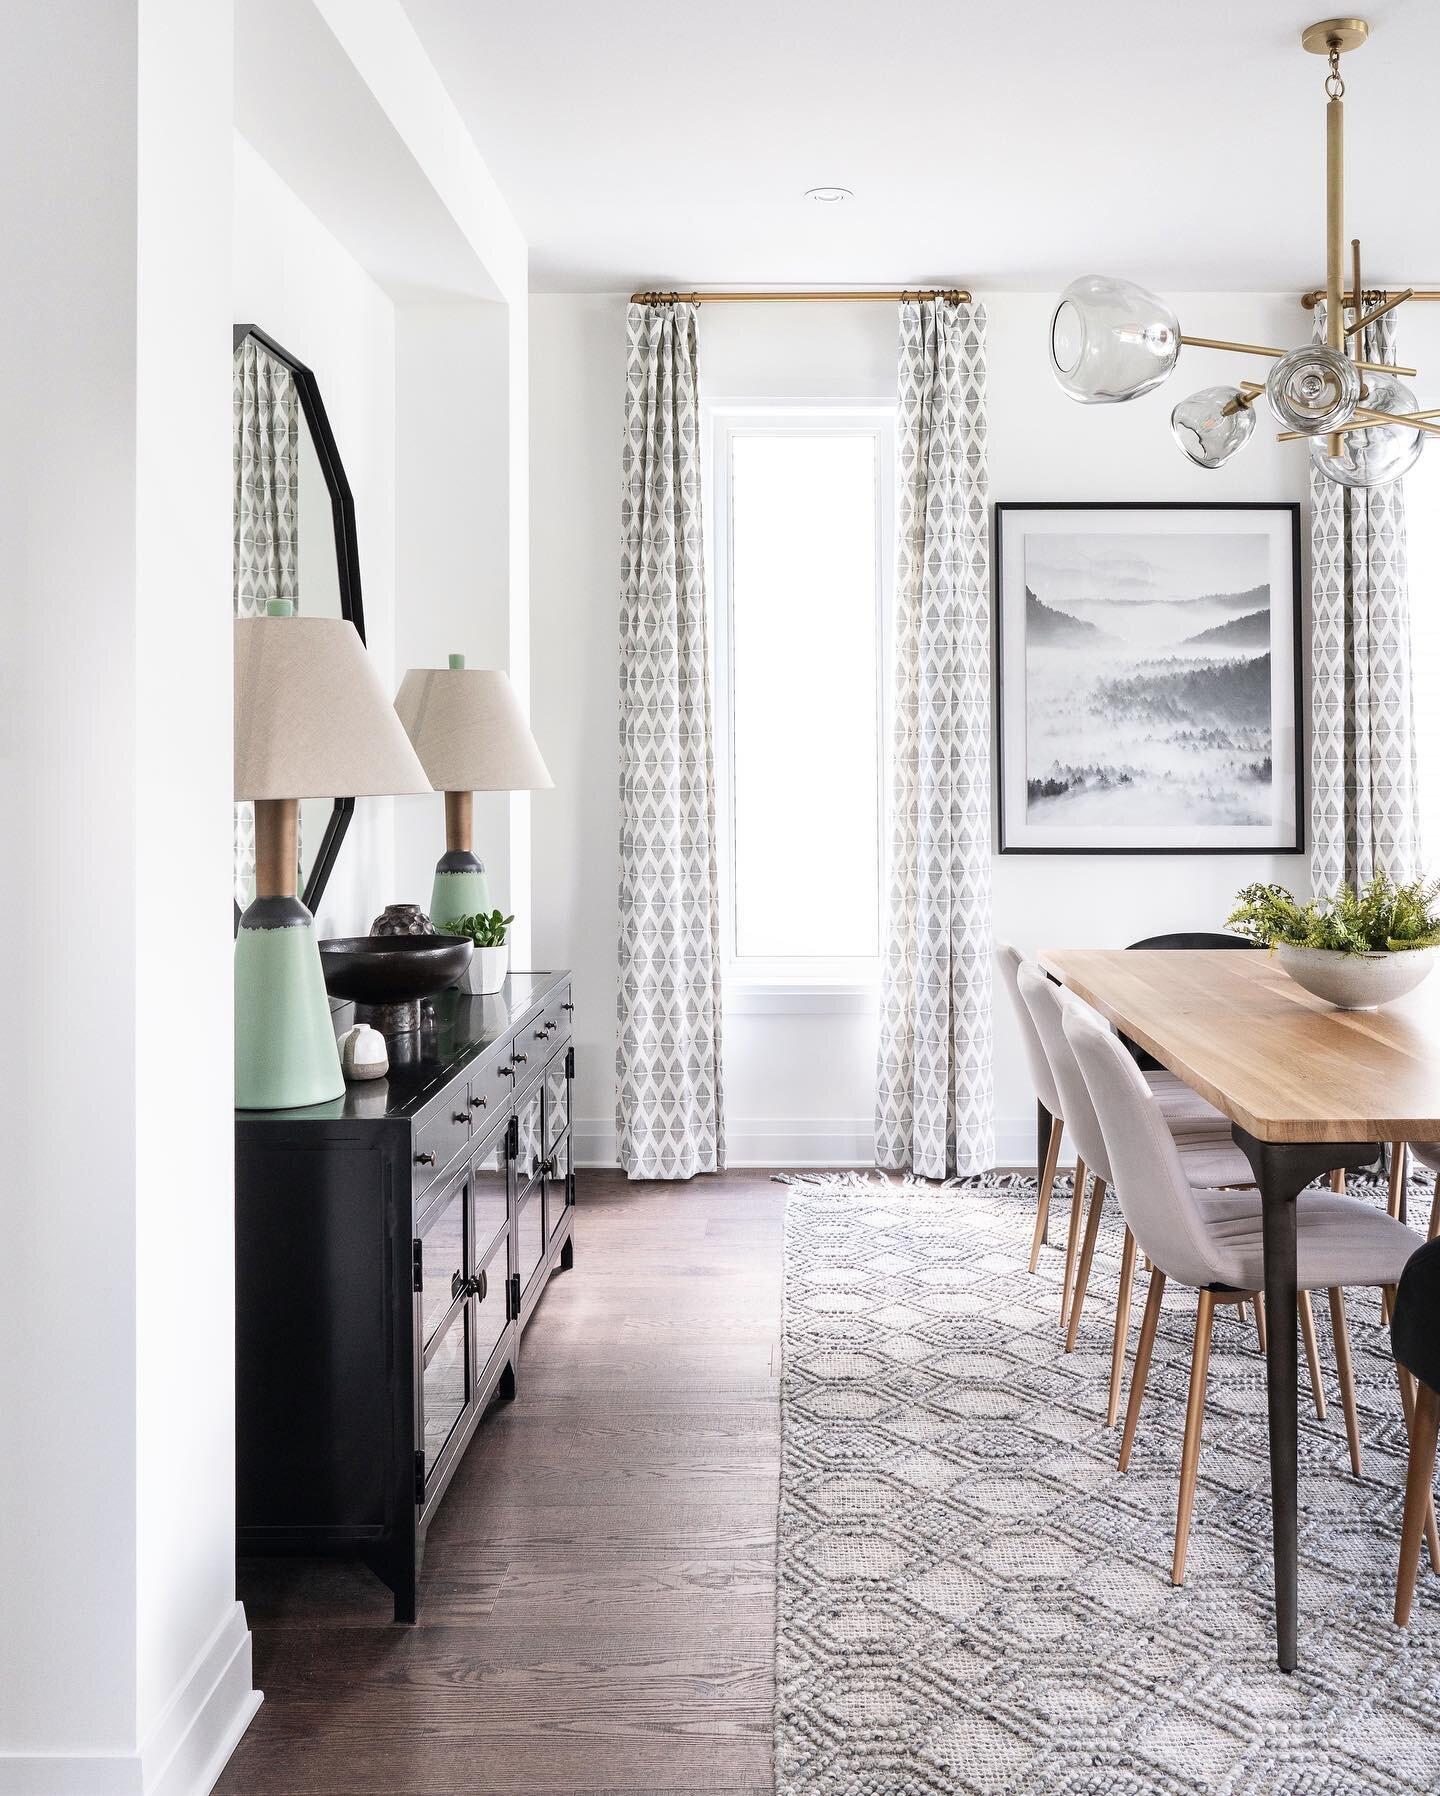 Shop the dining room |   Coyman Console Table  ,   Tia Mirror  ,   Carol Table Lamp  ,   Holloway Grey Rug